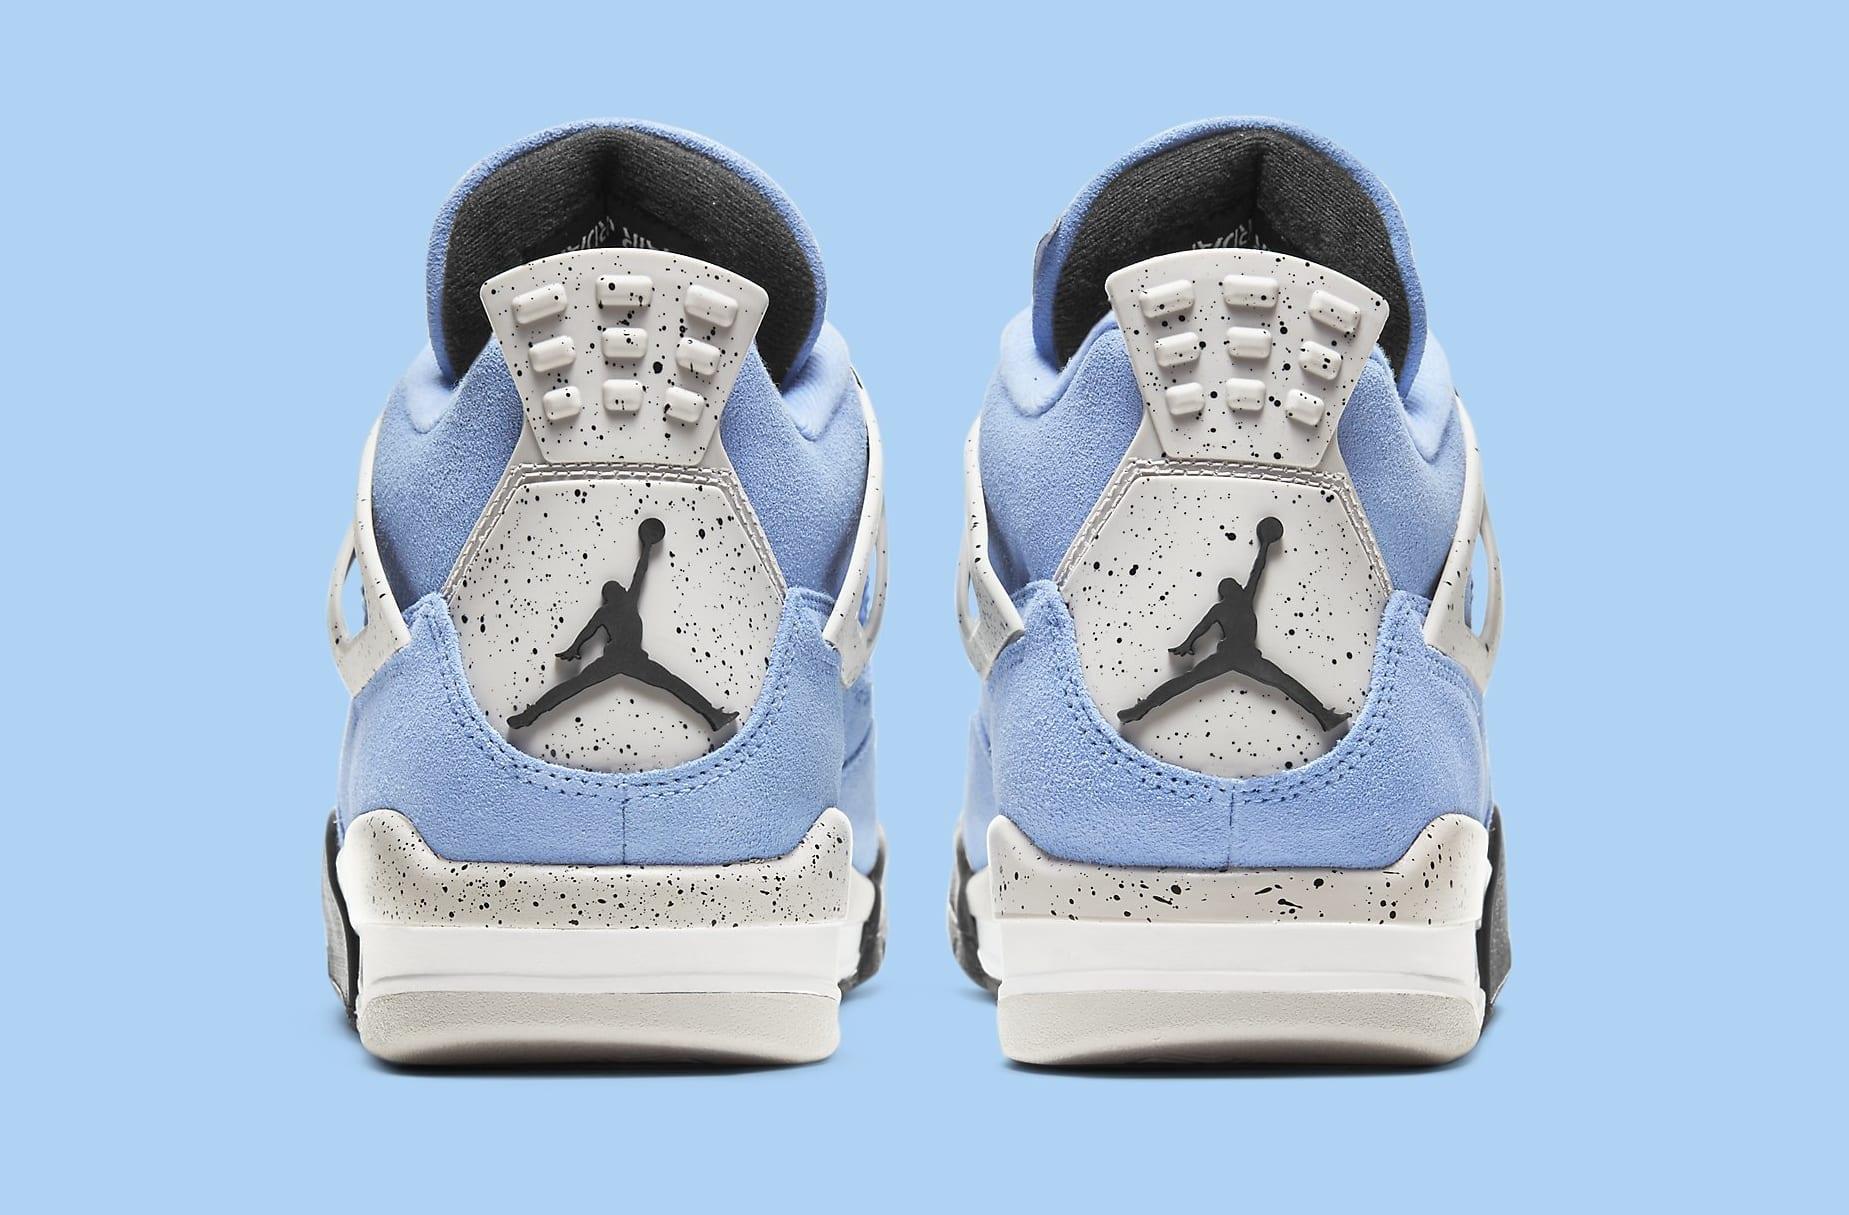 Air Jordan 4 Retro 'UNC' CT8527-400 Heel